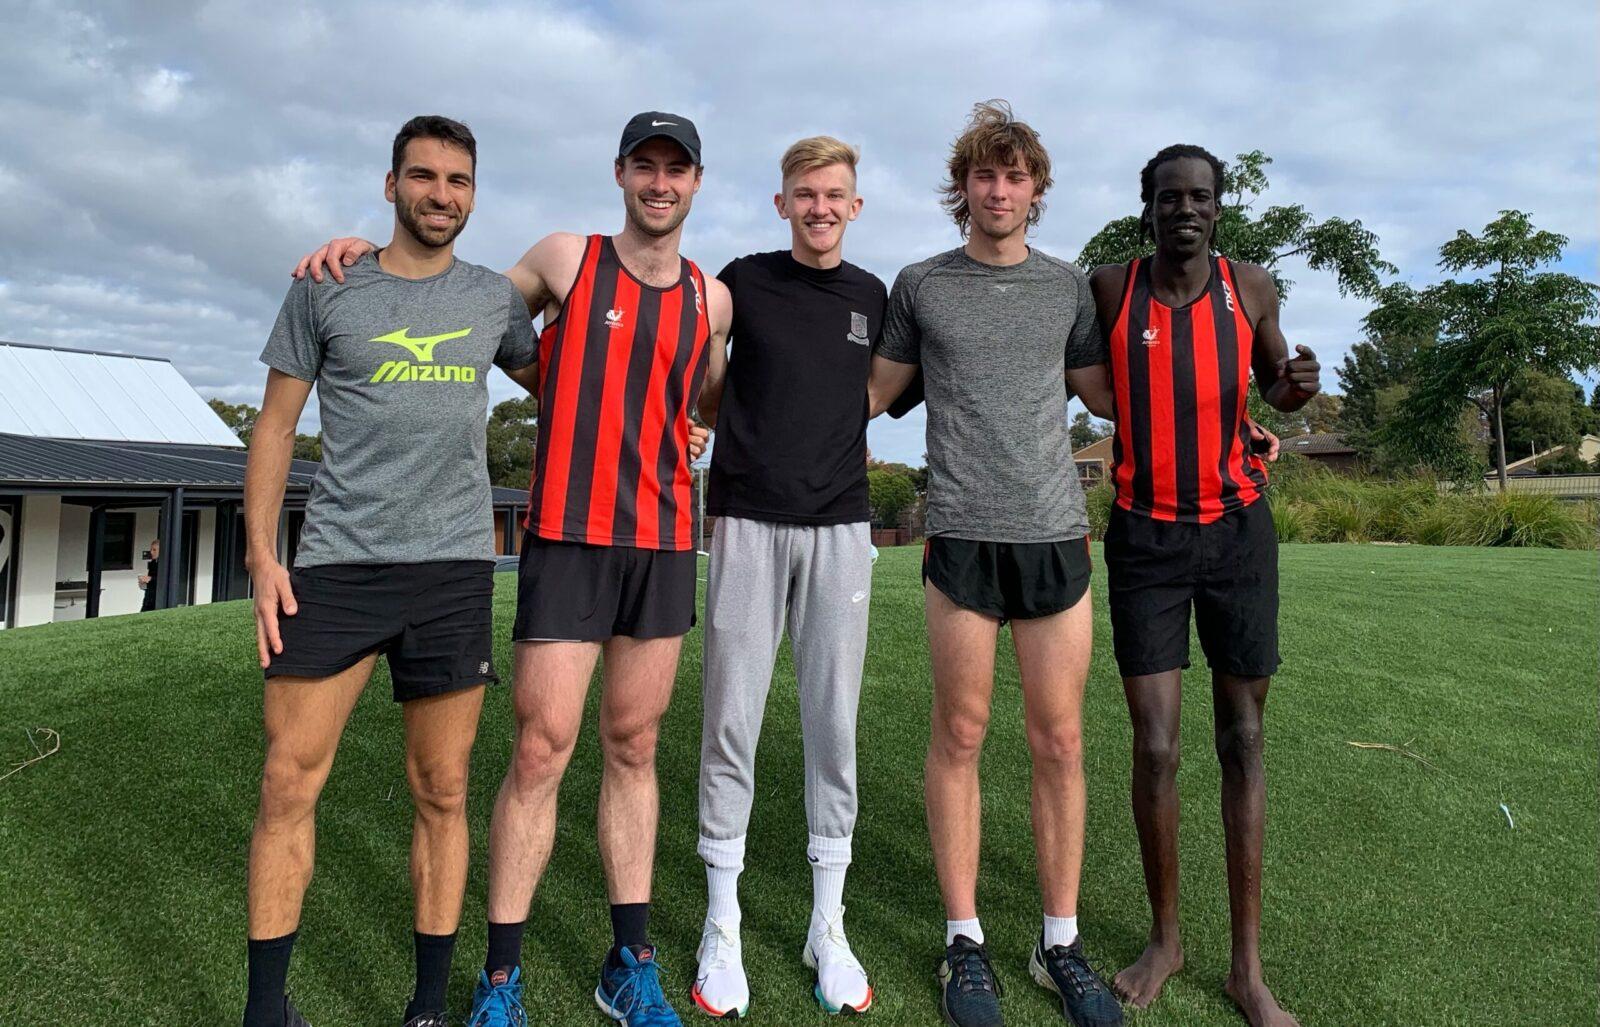 Five runners